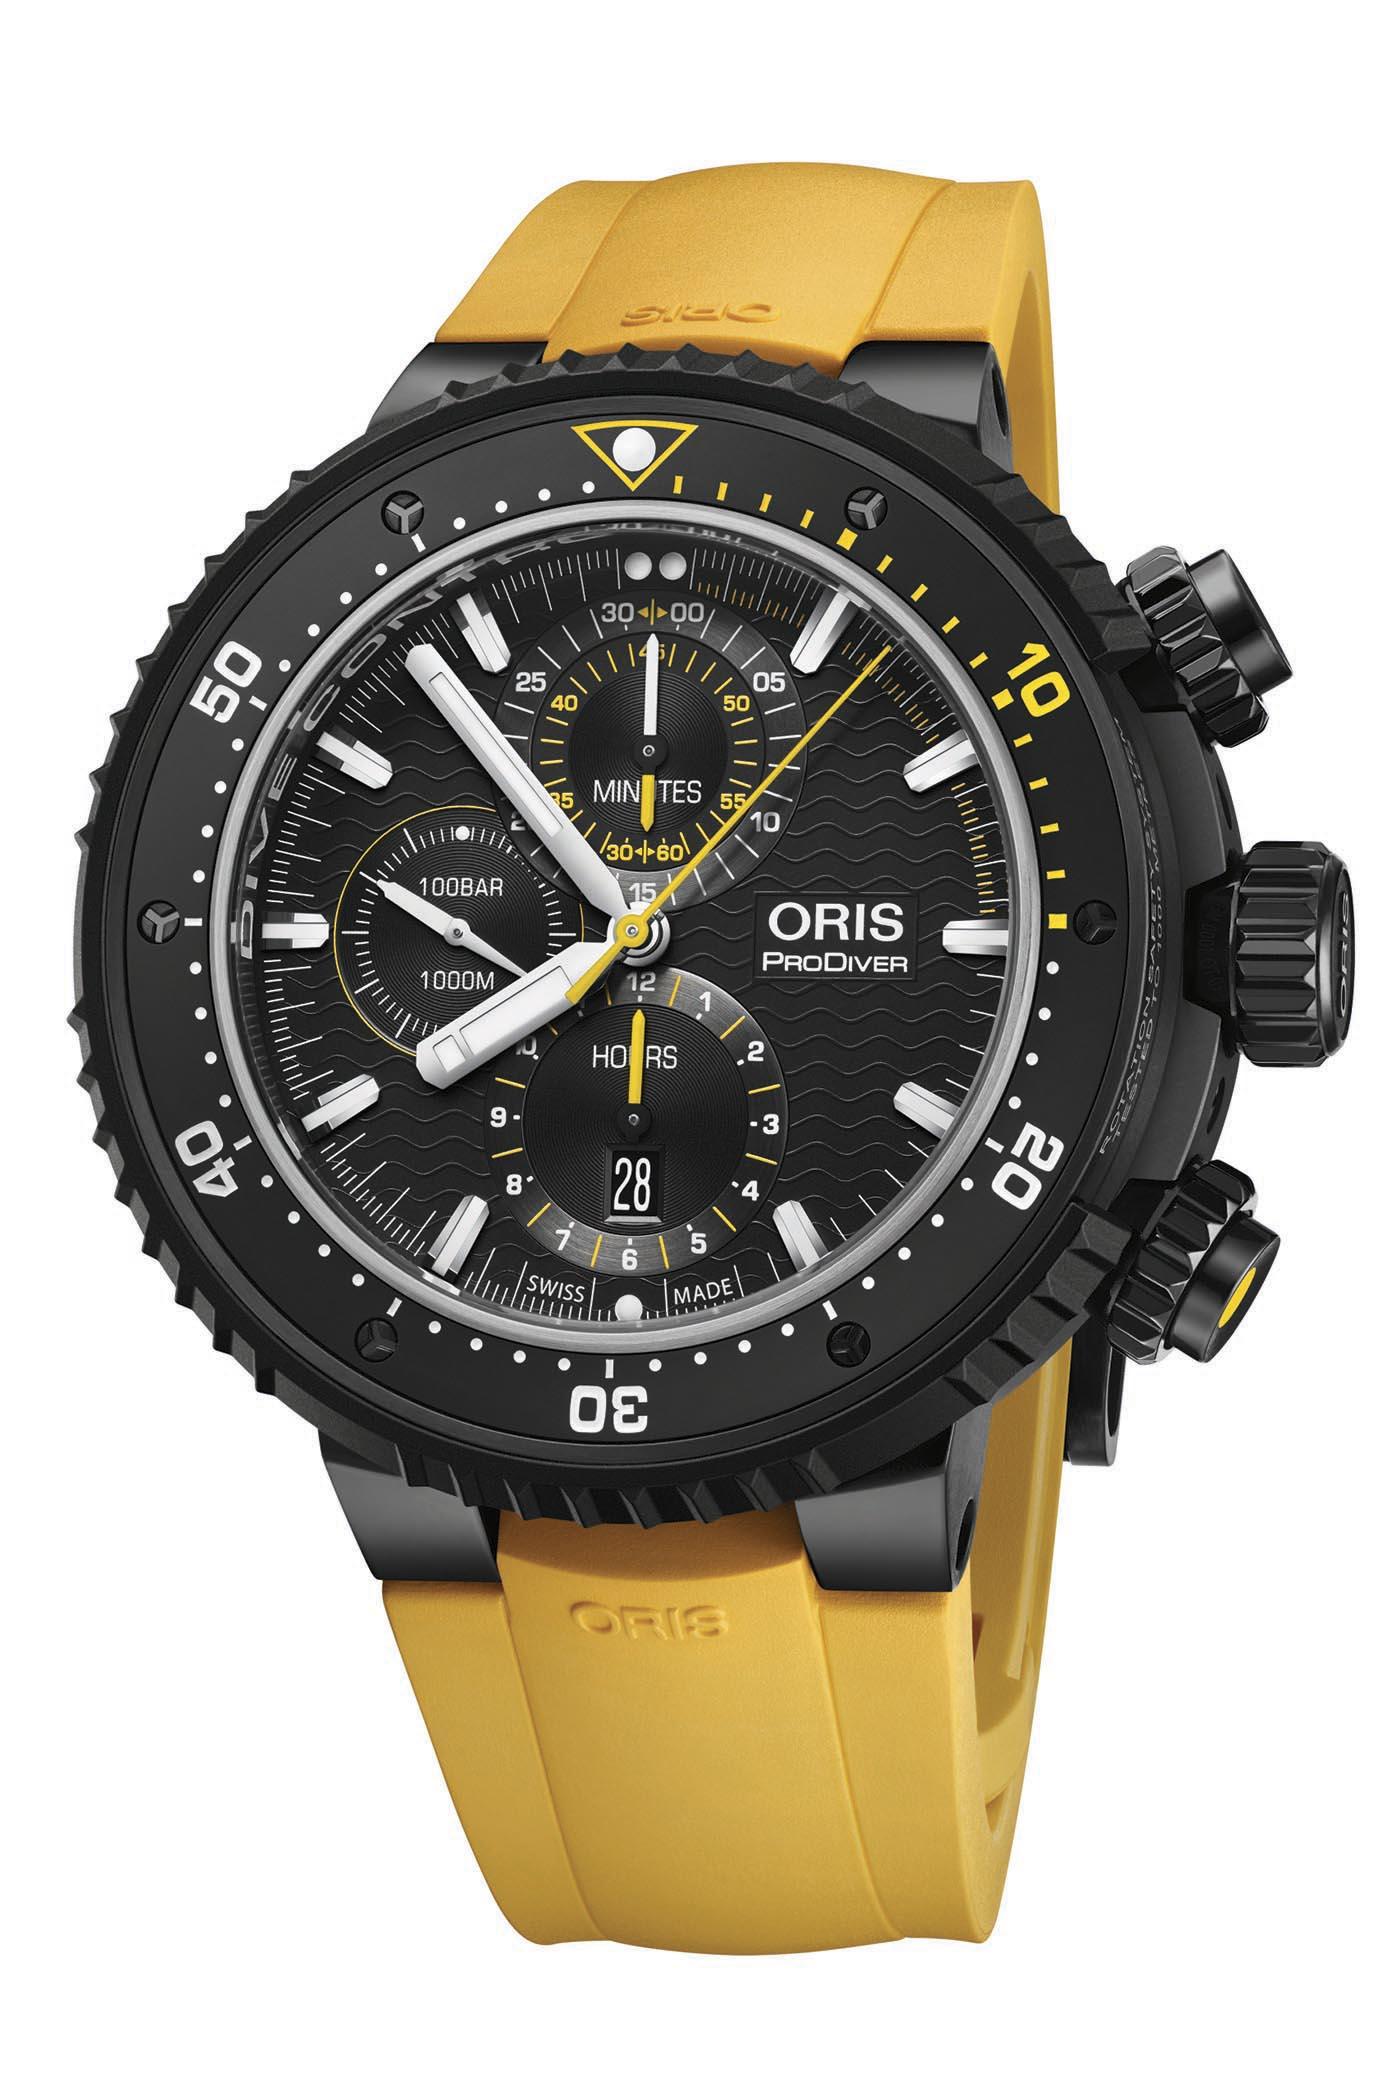 Oris Dive Control Limited Edition - 13